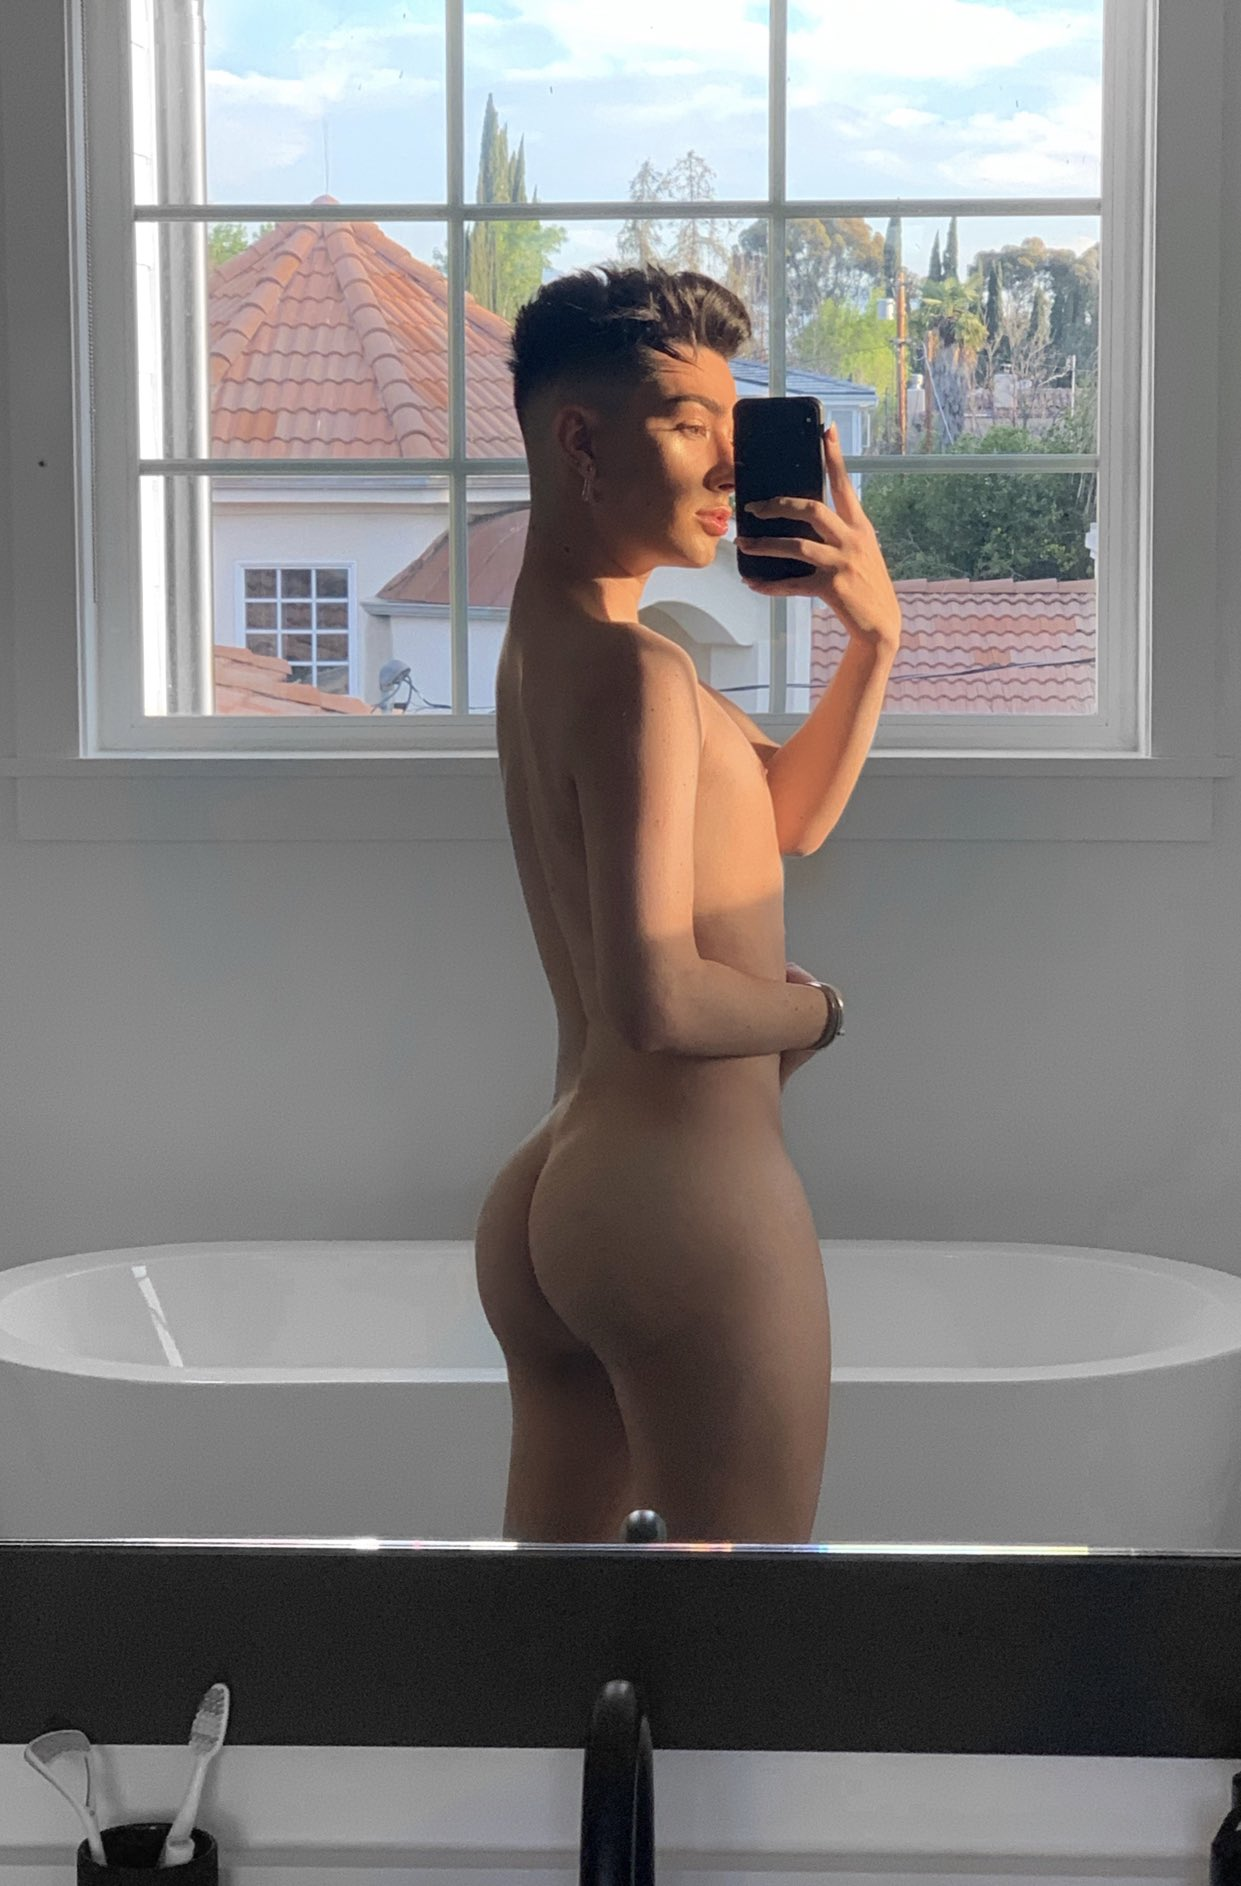 James Charles Leaked Nudes